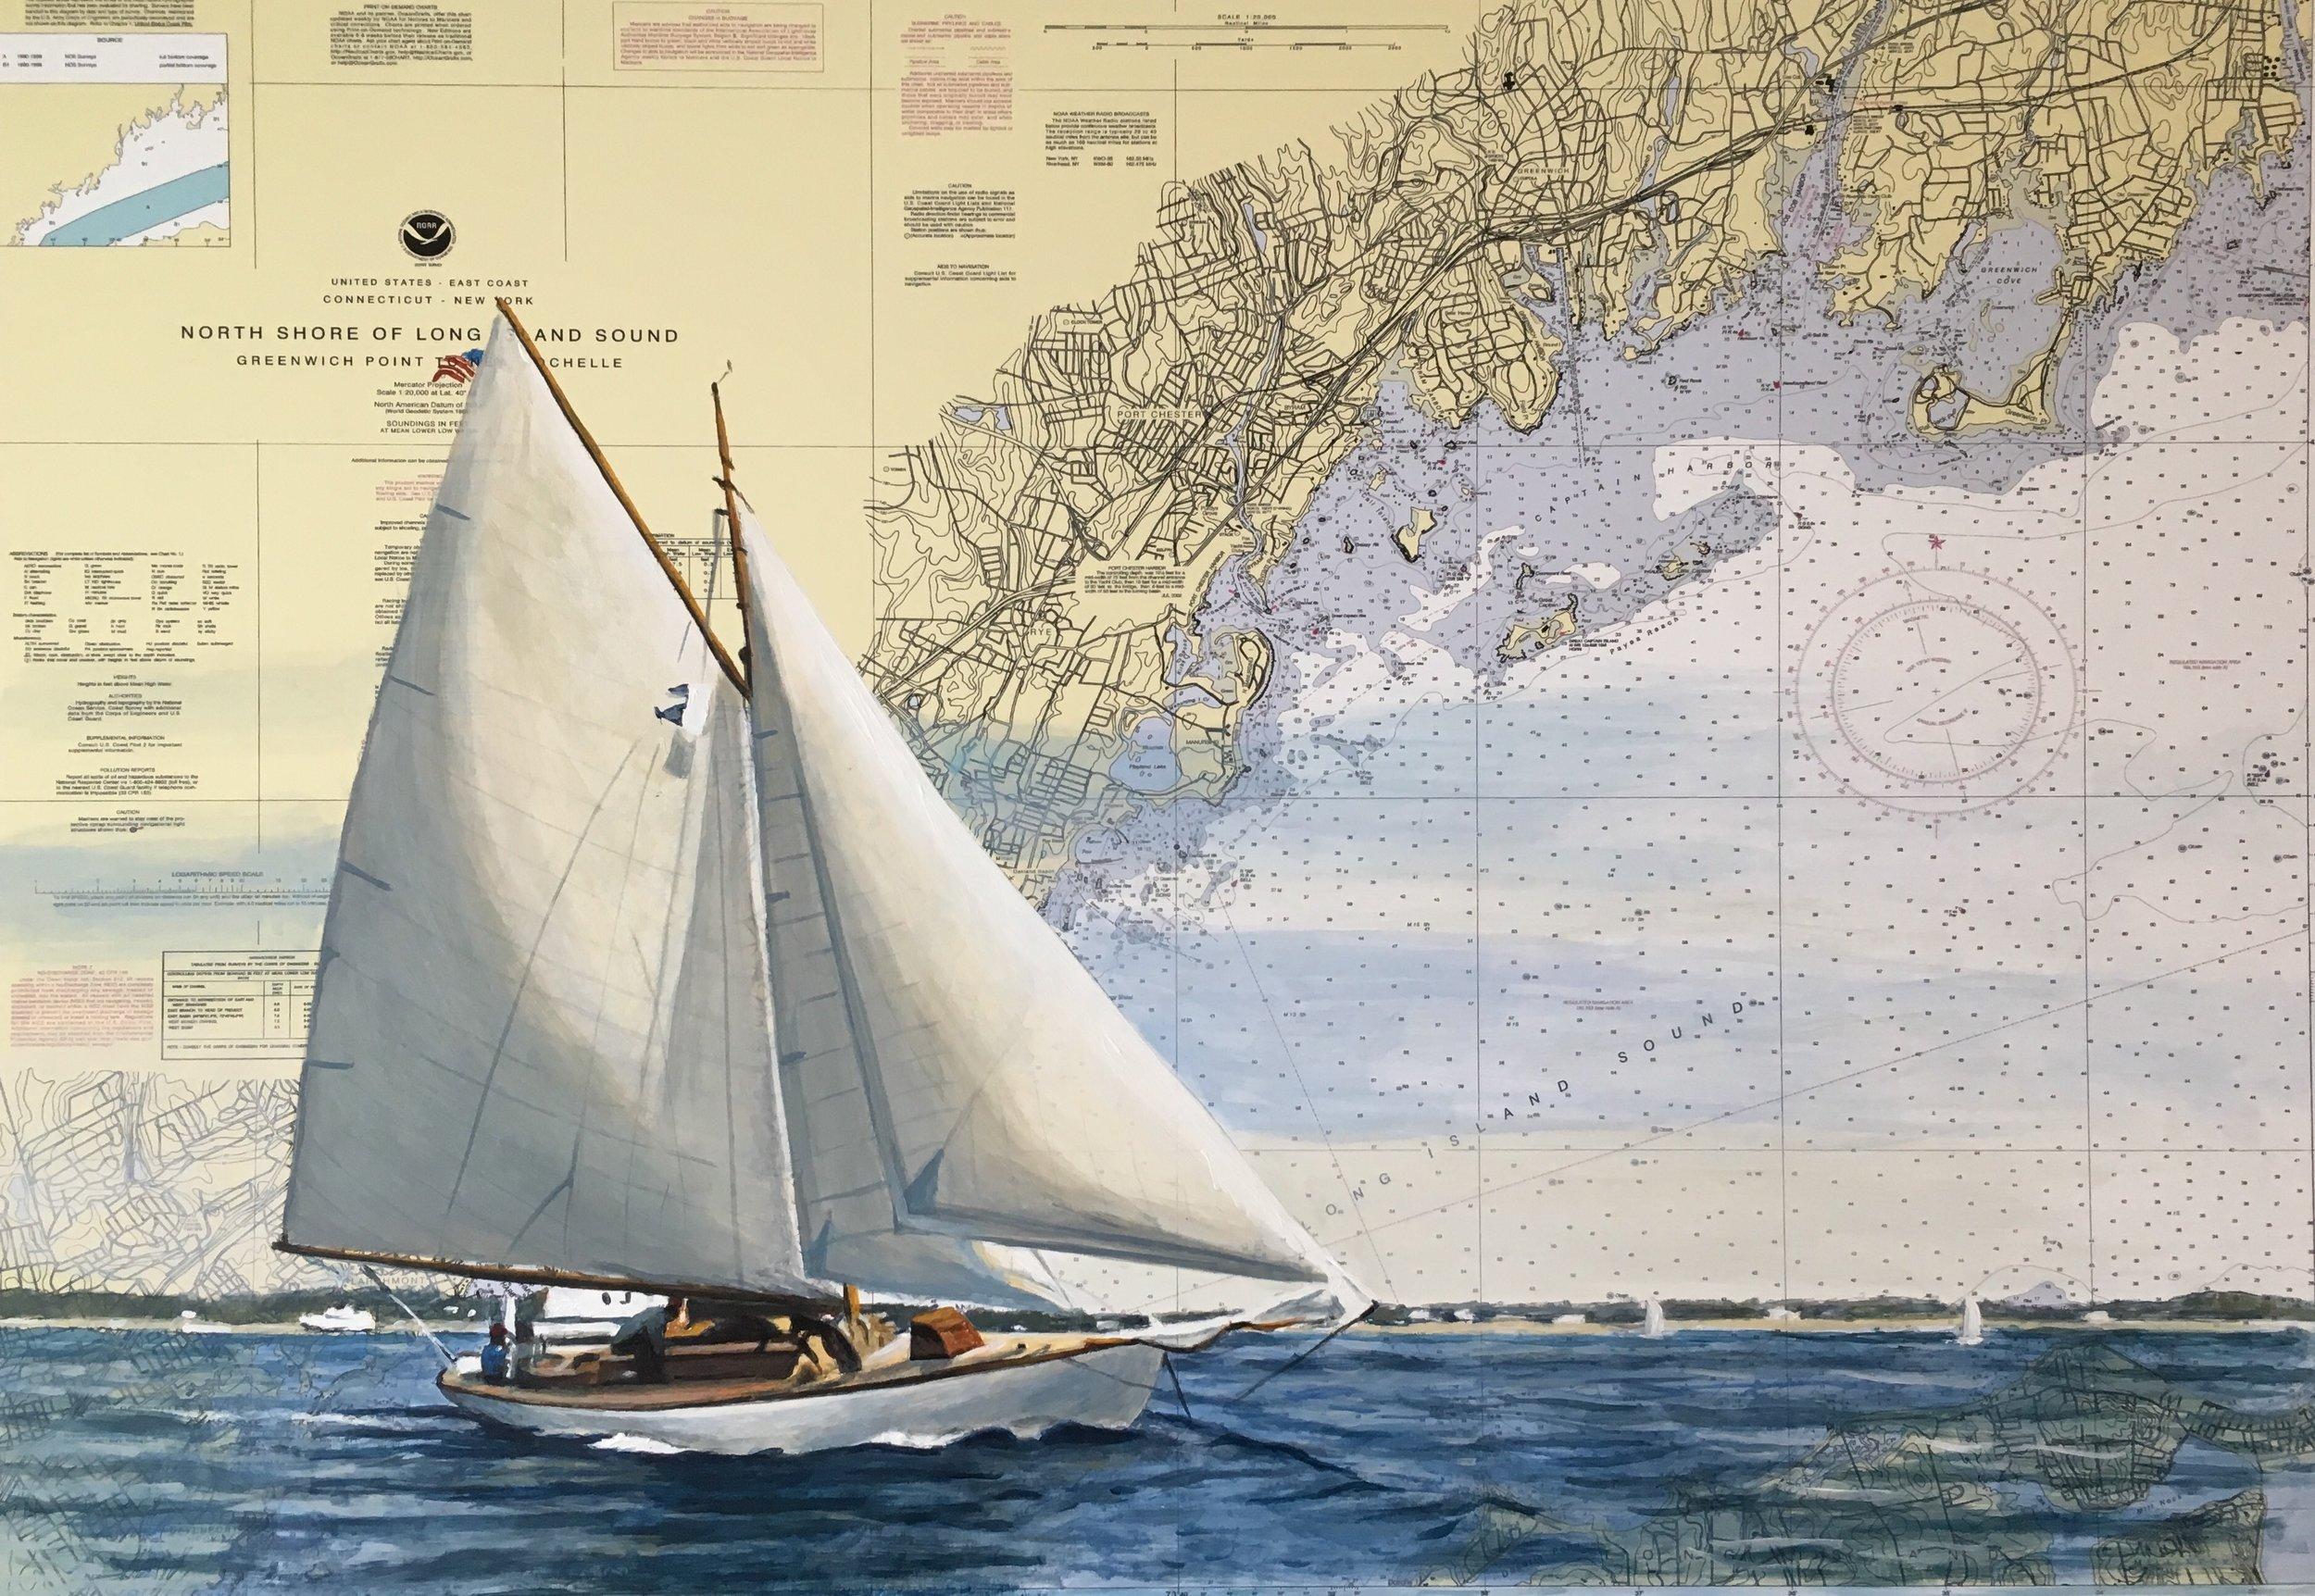 Long Island Sound-Greenwich Point